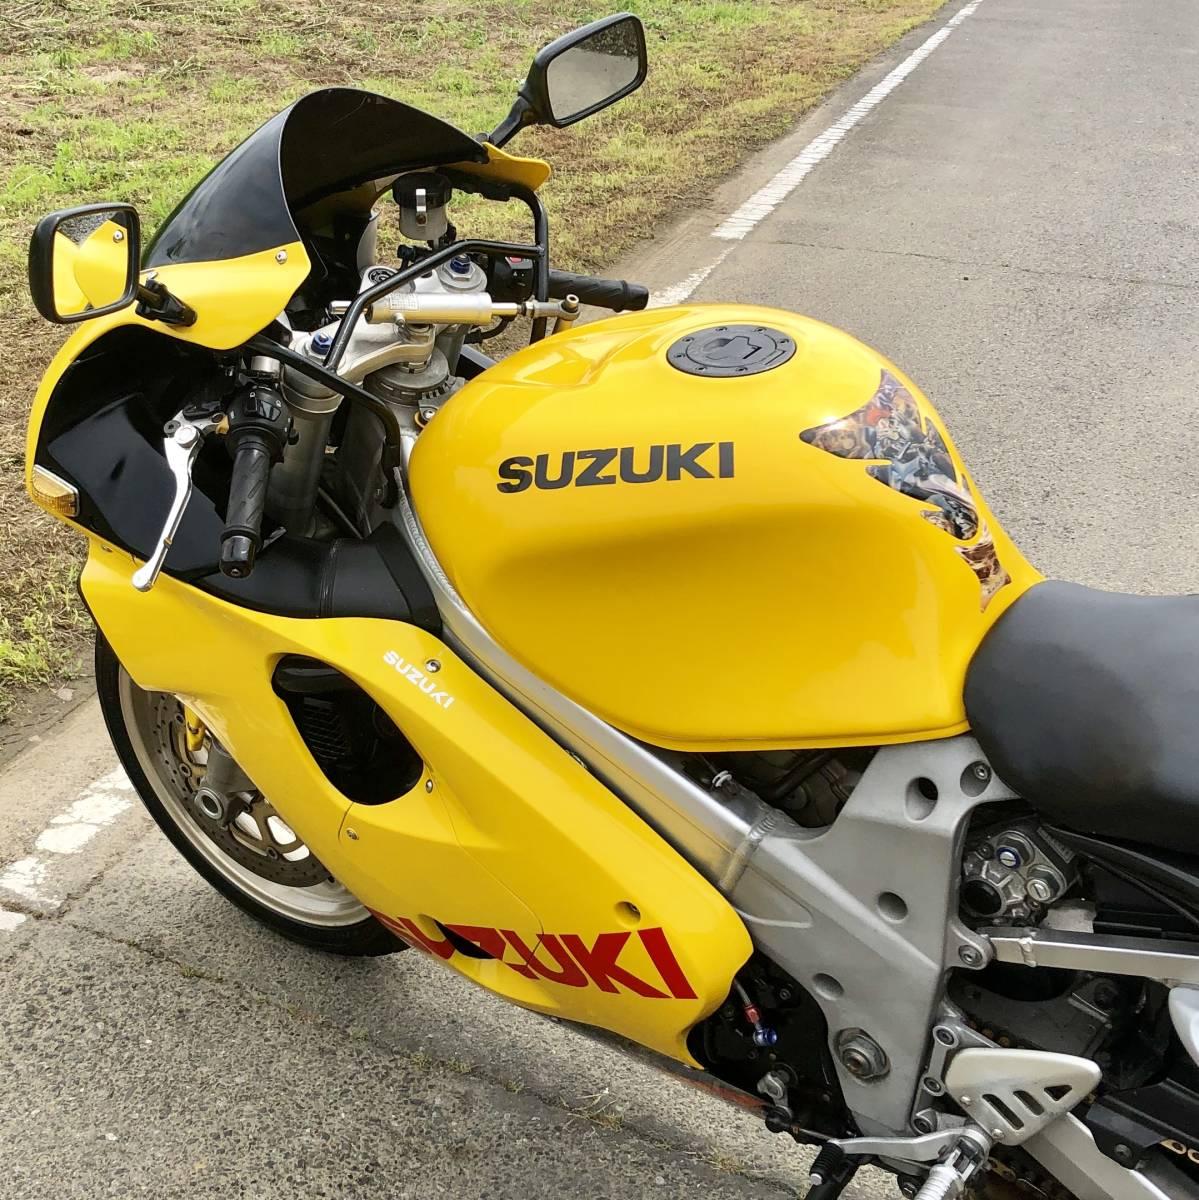 TL1000R VT52A 実動 書類付き 平成10年 大迫力 スズキ 検) TL GSX GT GS FX Z1 XS XJ CB CBR ZX FZ YZF ZZR SS GSF X11 ハヤブサ ゼファー_画像6